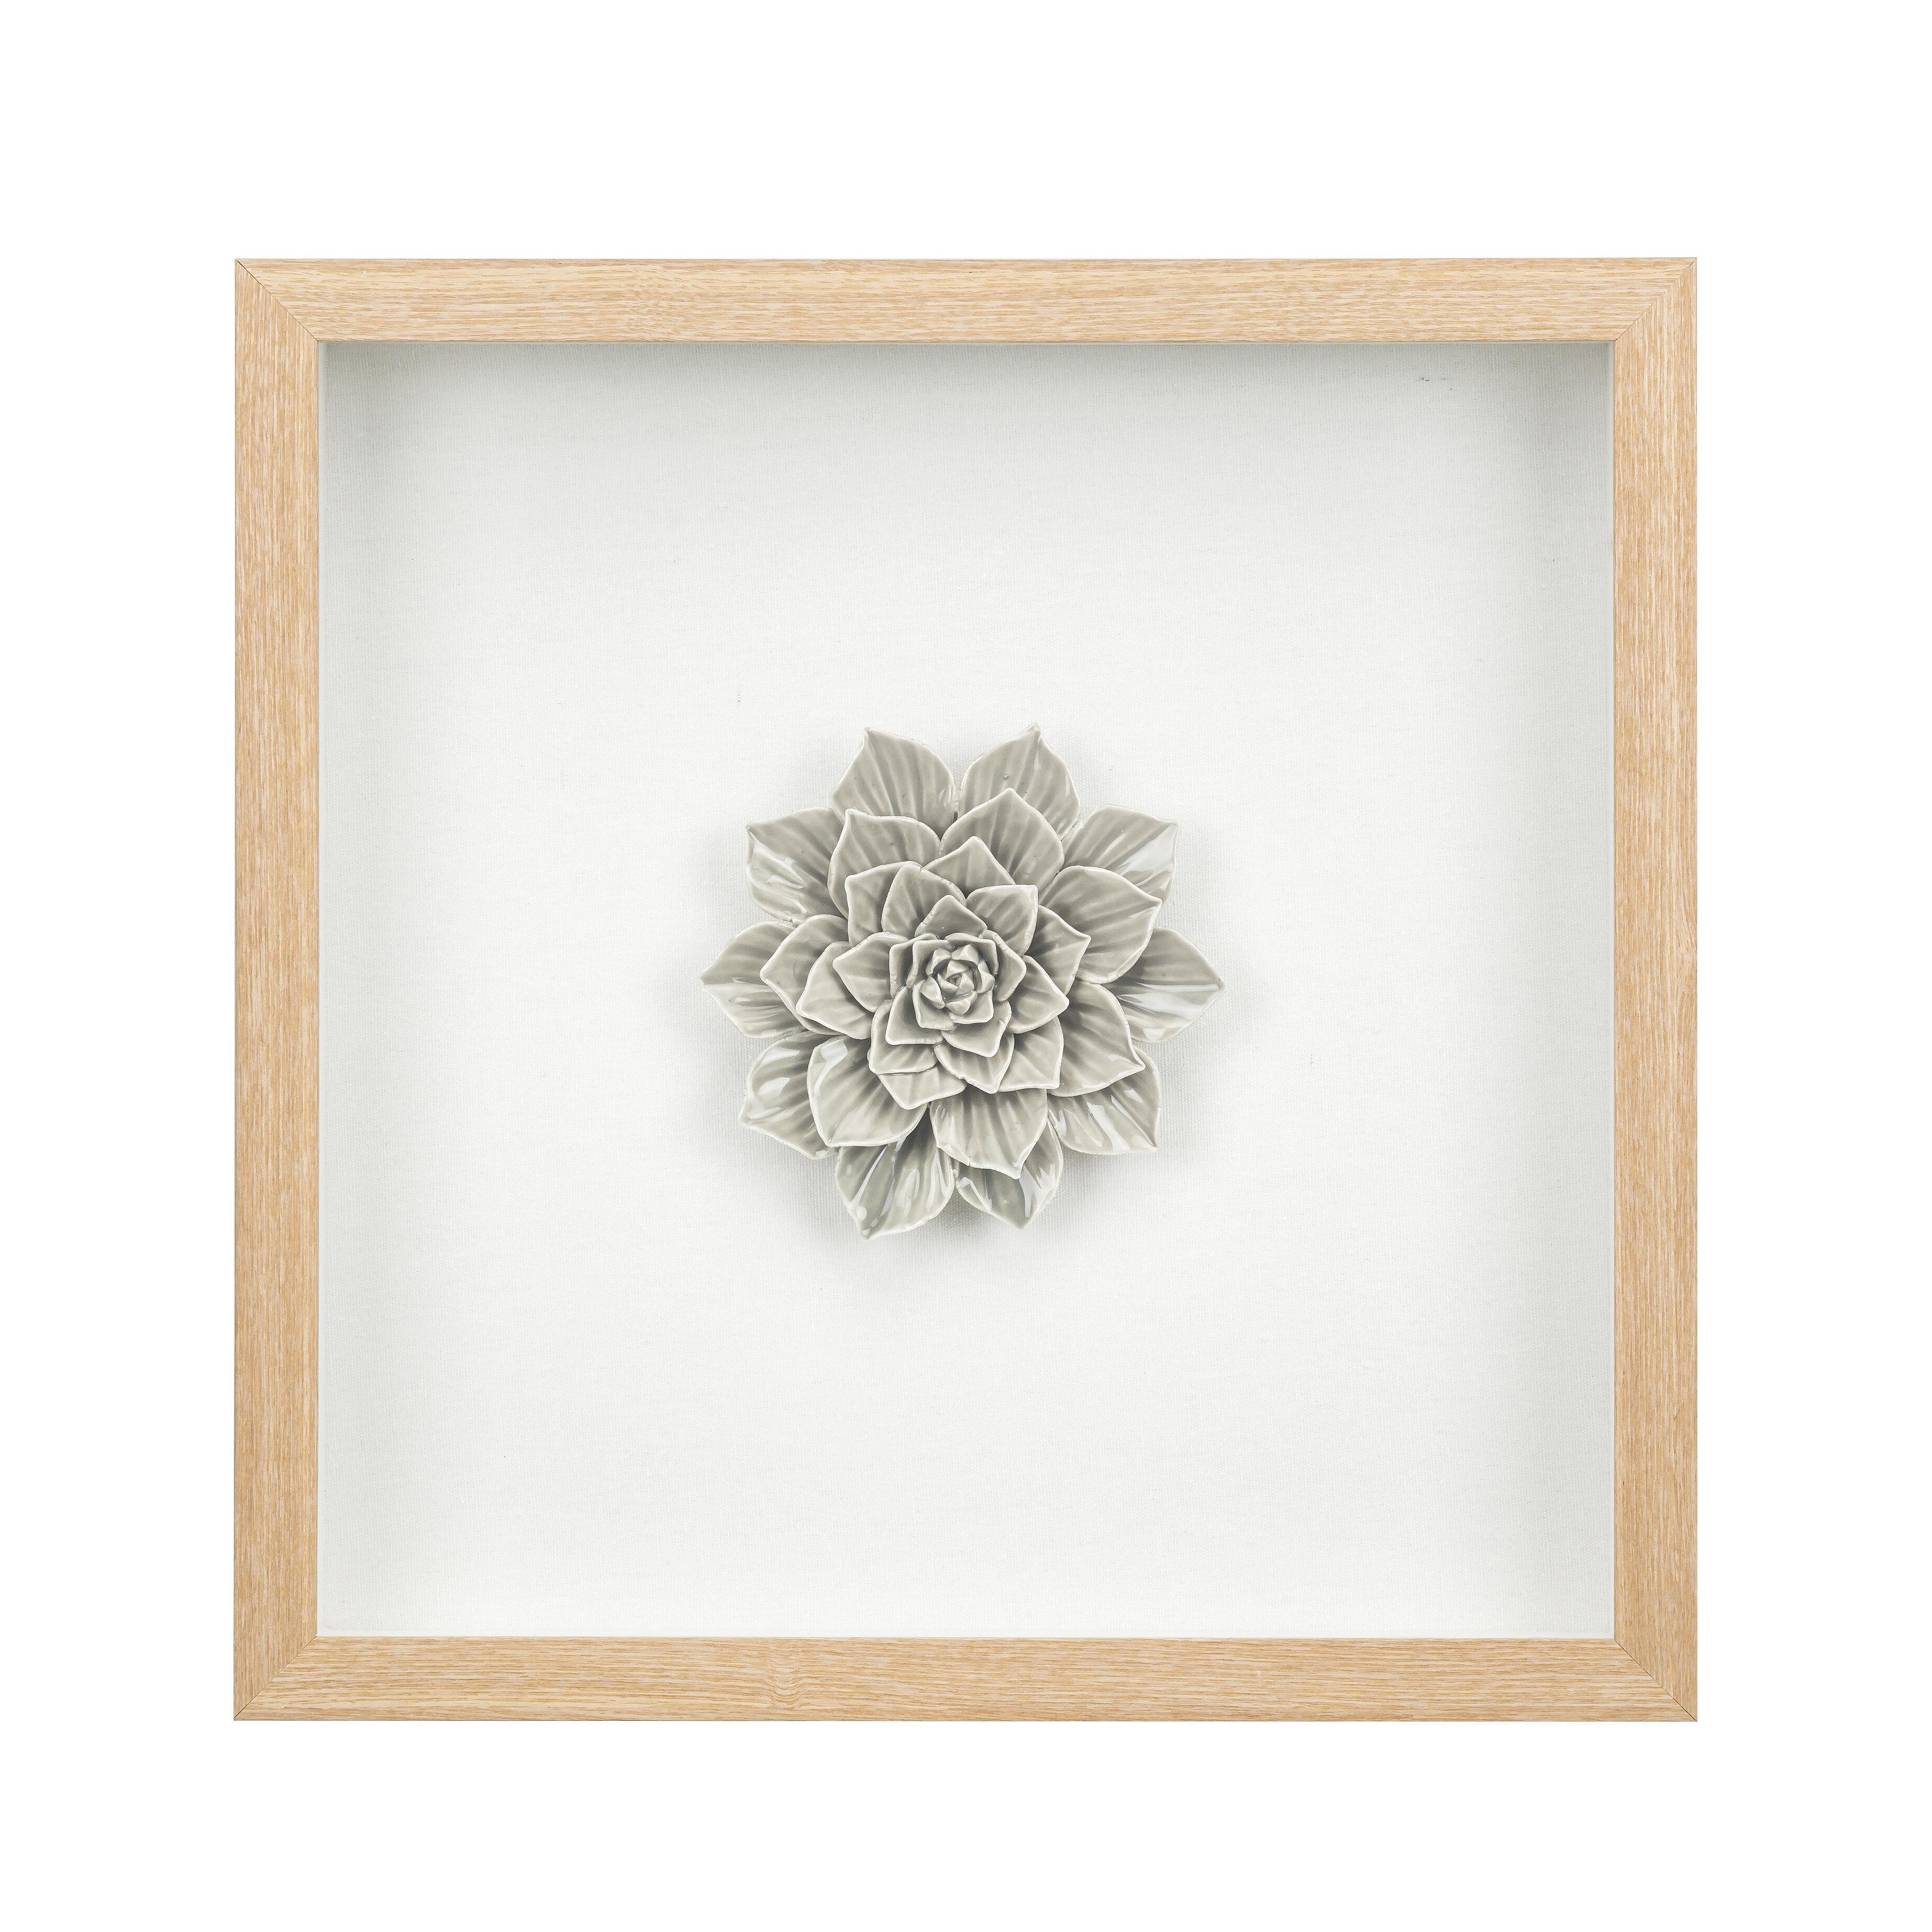 Ceramic Flower Wall Décor